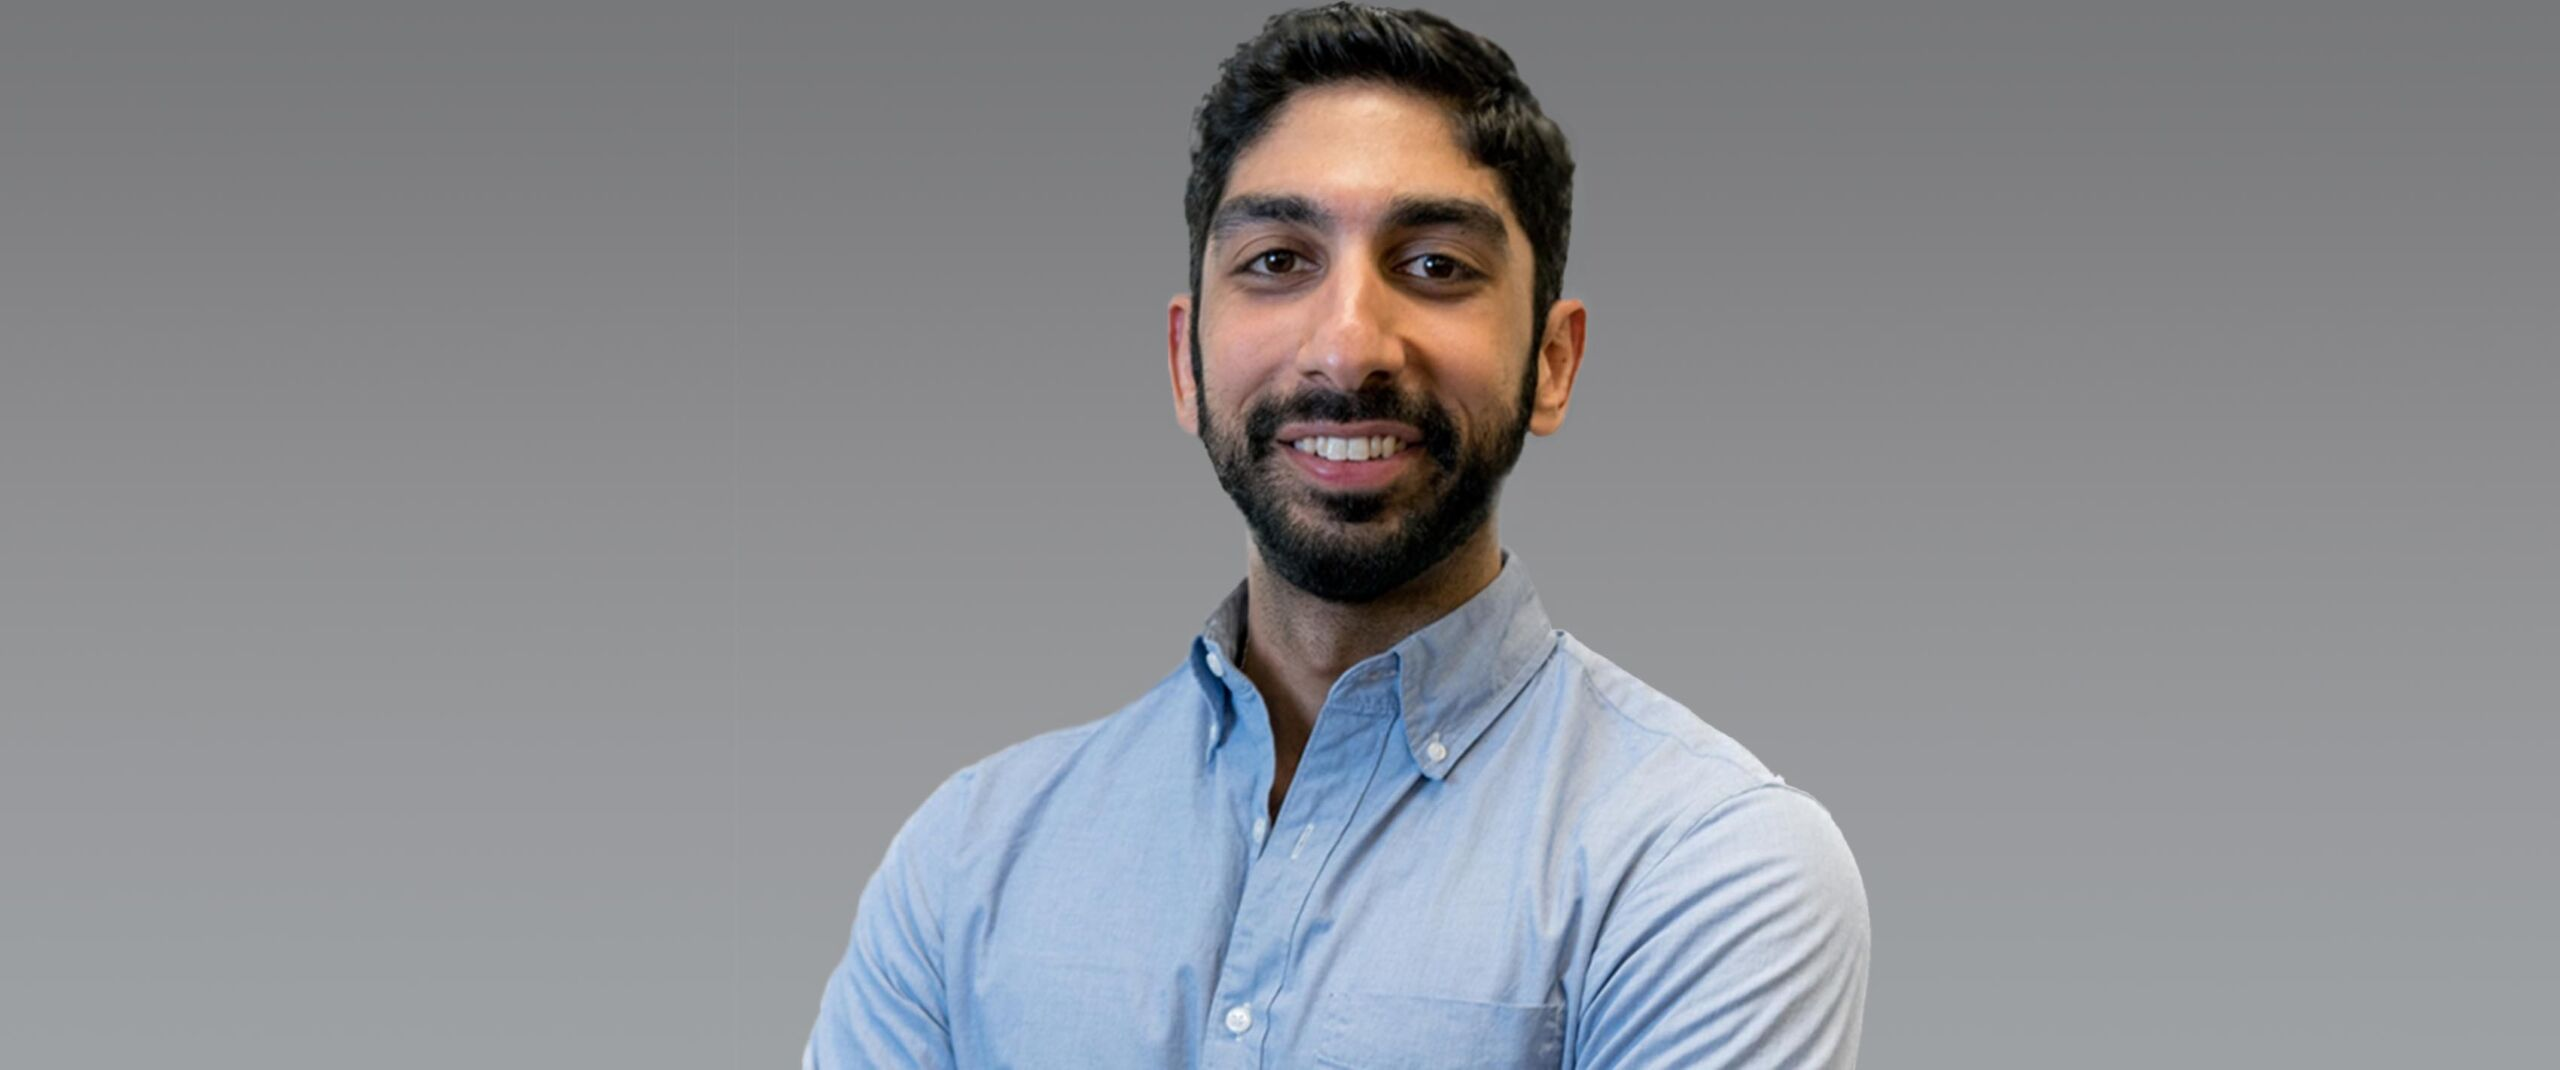 Anshul Ruparell